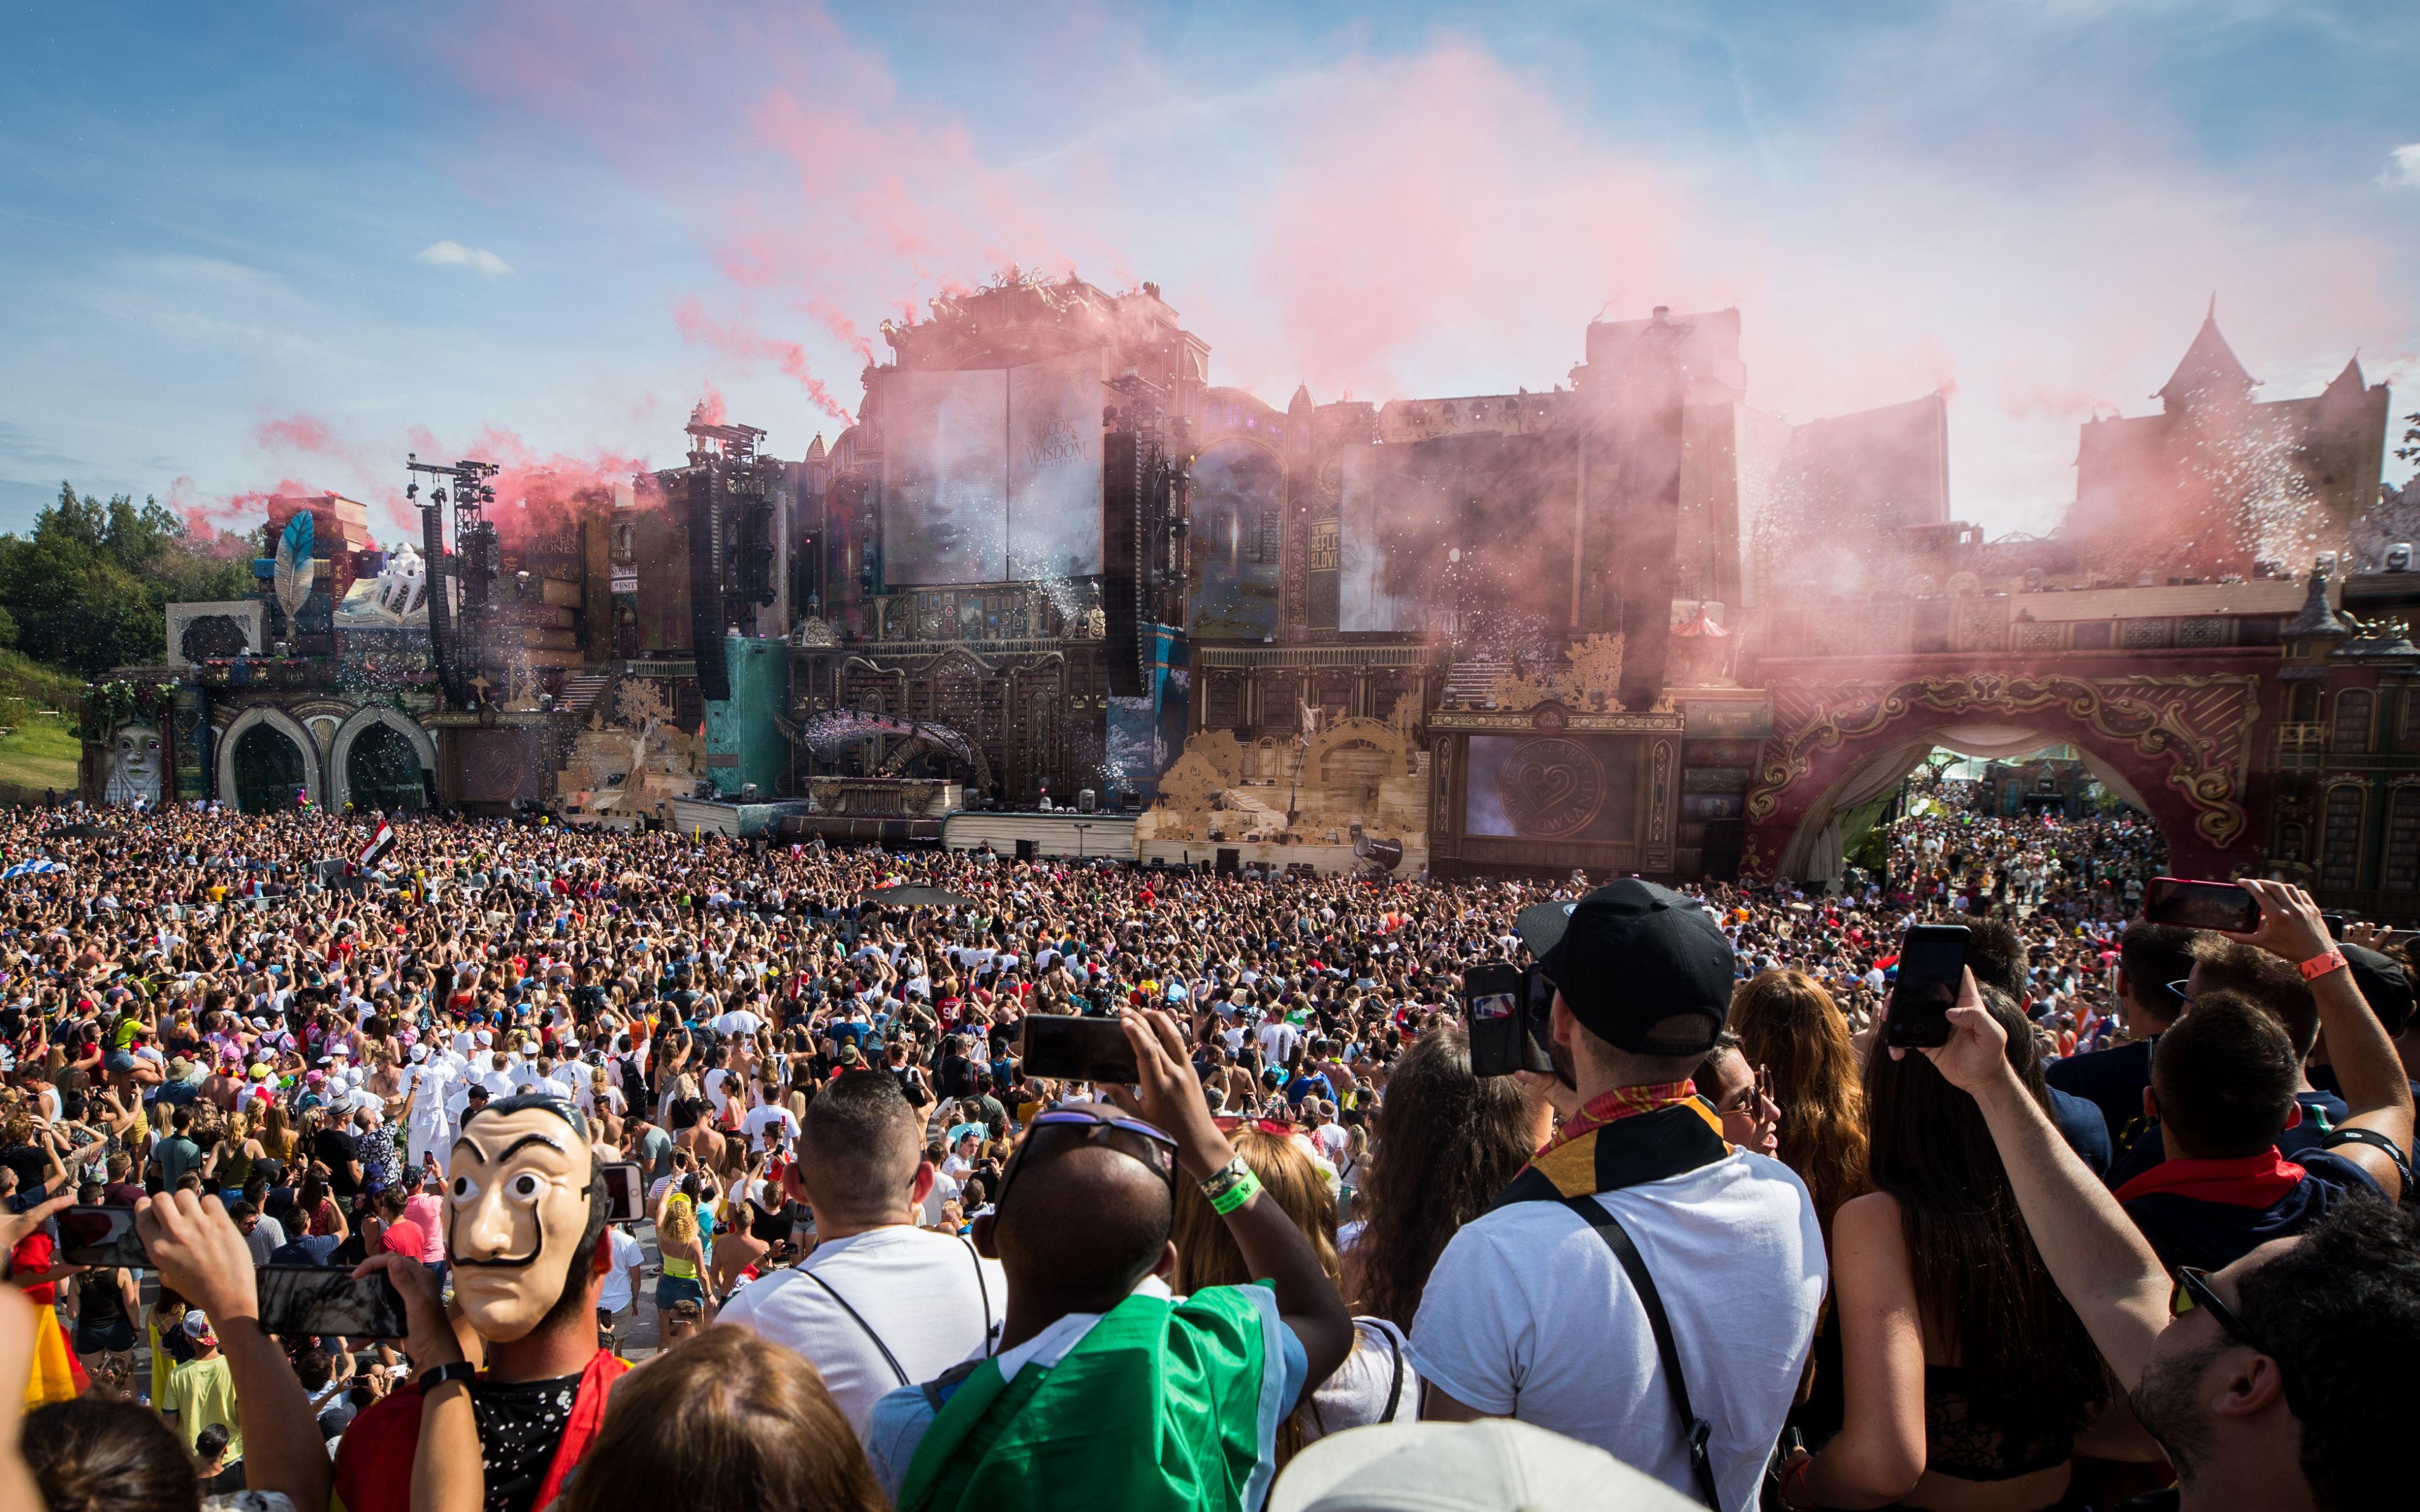 Waarom Tomorrowland zo'n groot tech-walhalla is